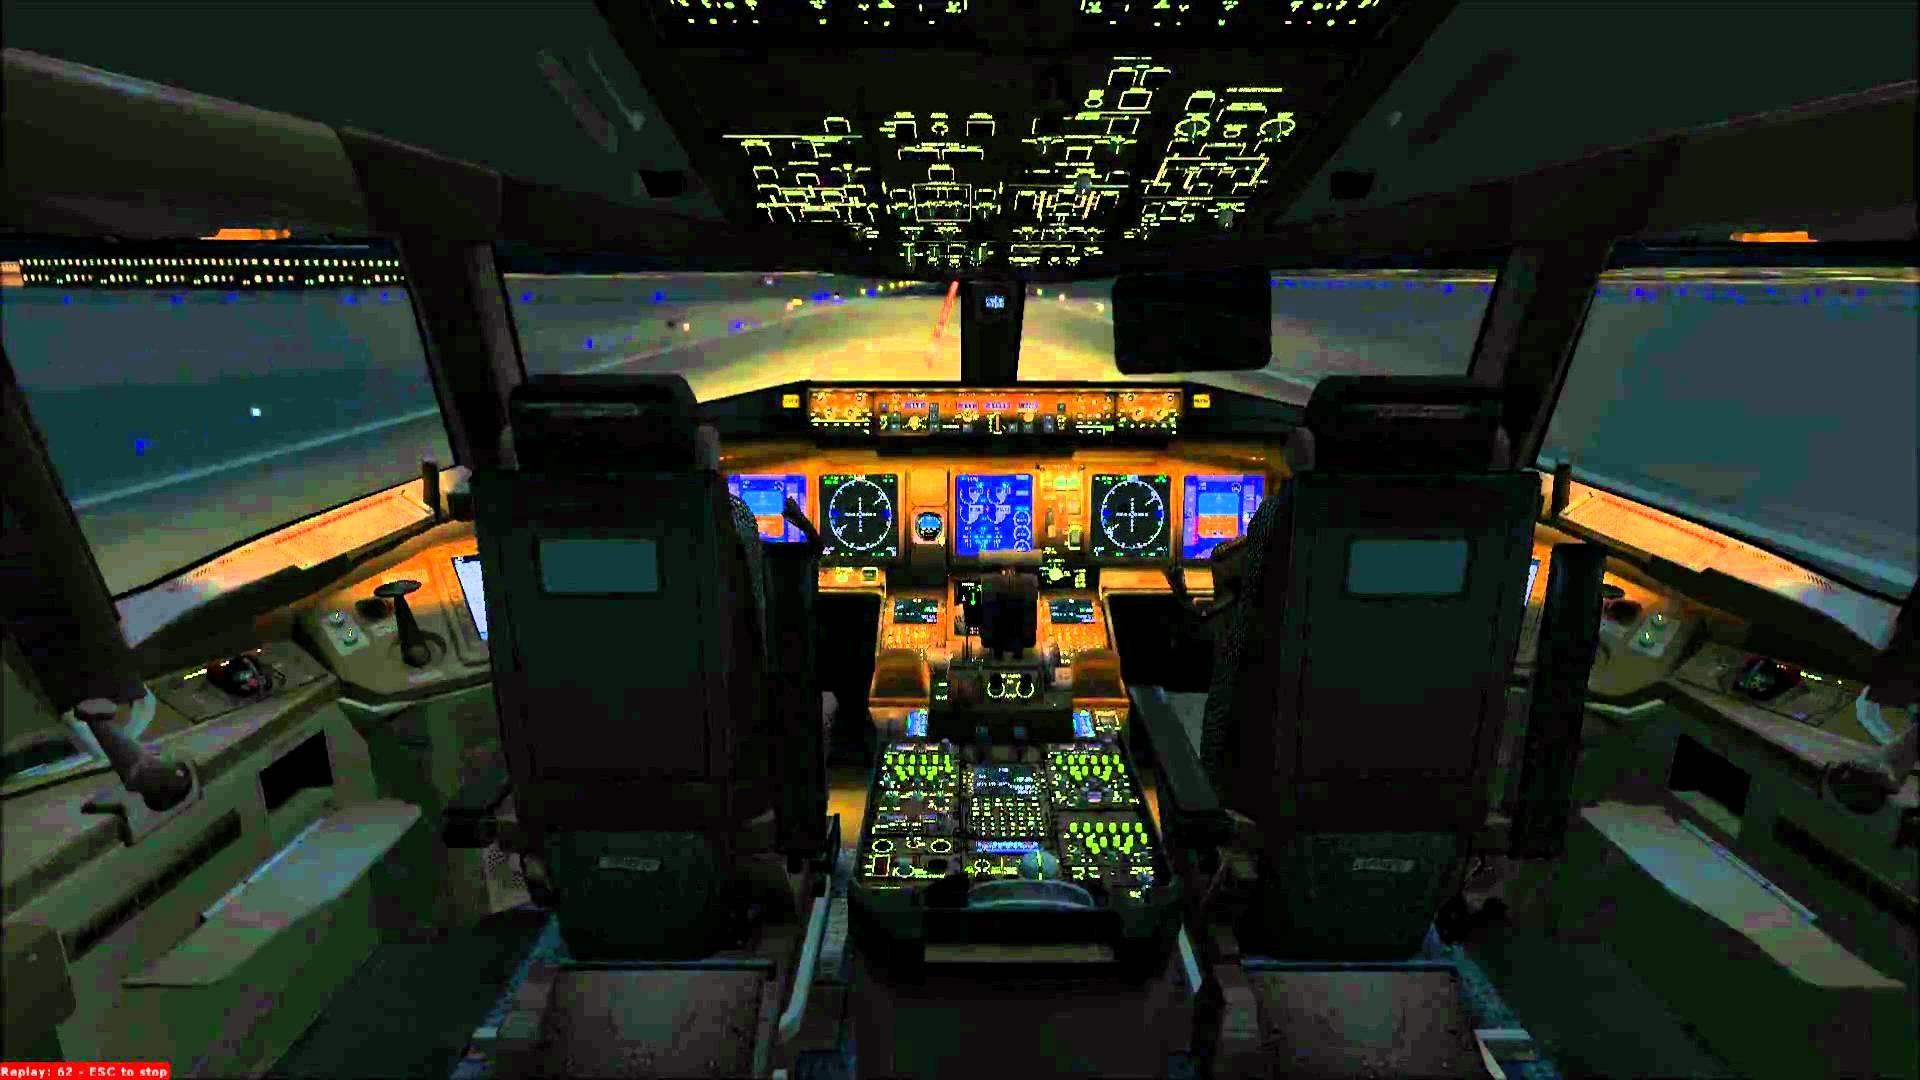 [HD] B777 cockpit landing Delhi ✈ – YouTube